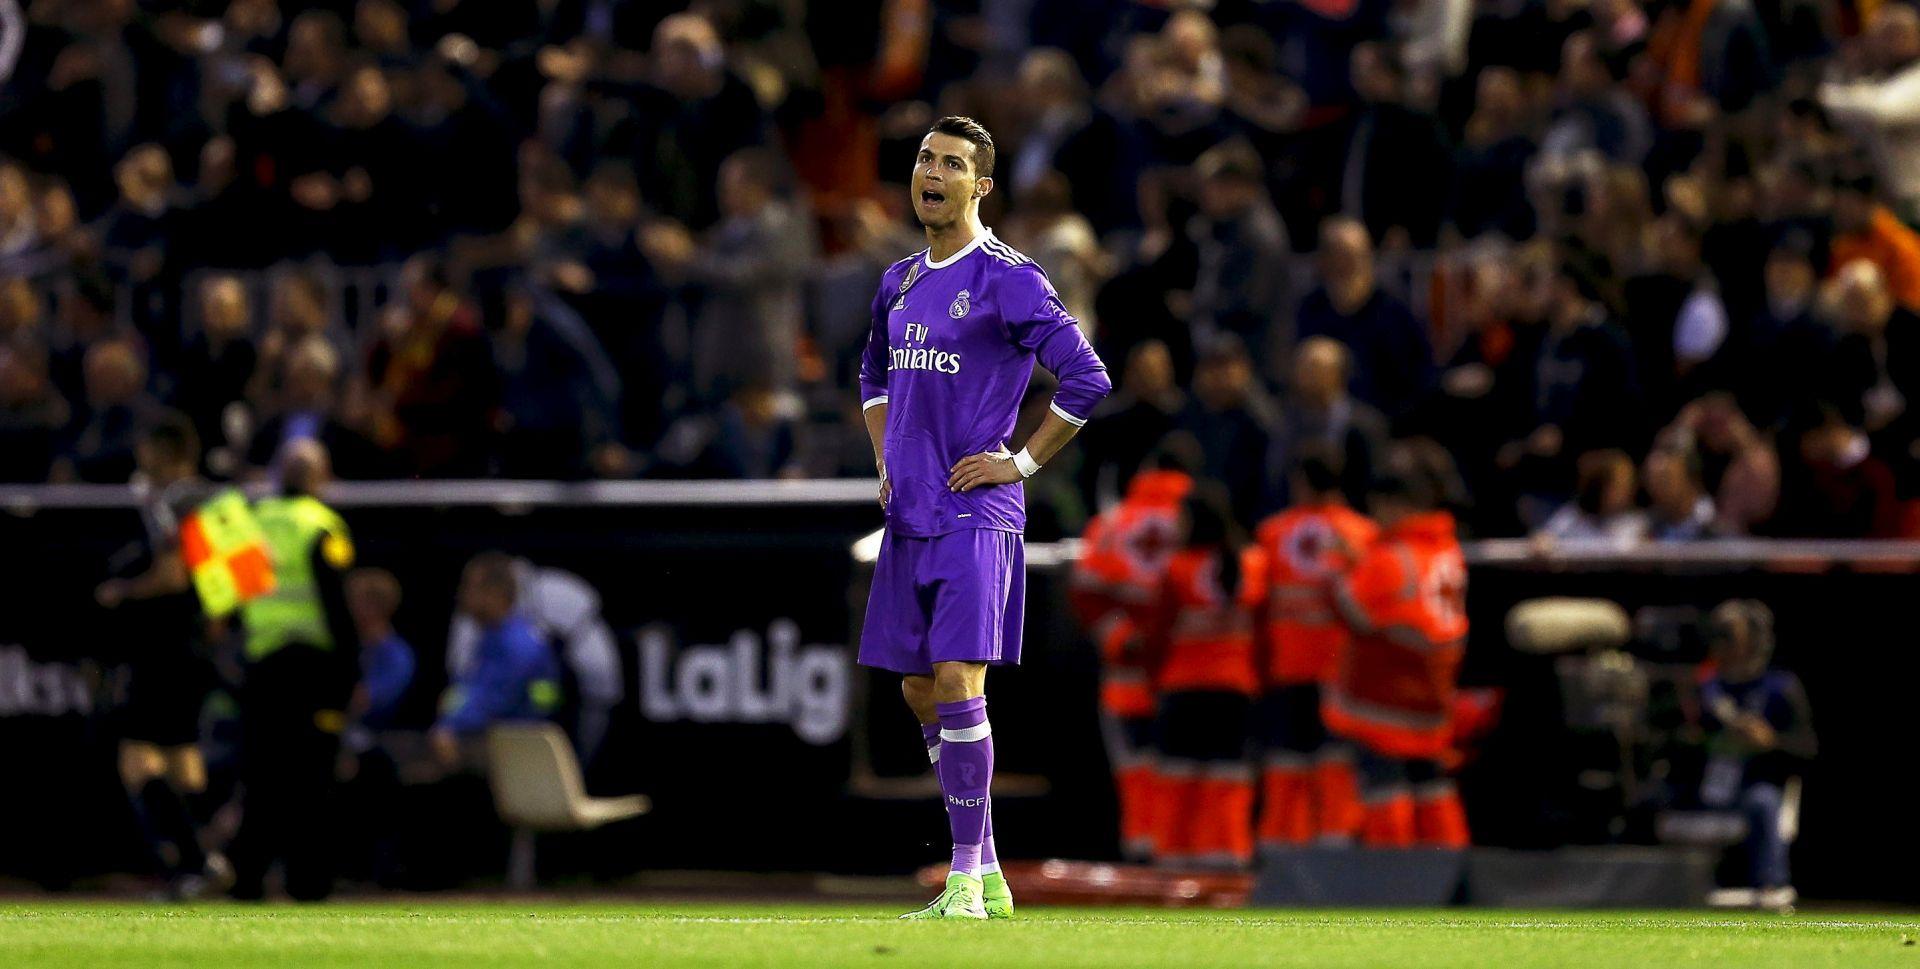 PRIMERA Real se nakon velikog preokreta vratio na čelo ljestvice